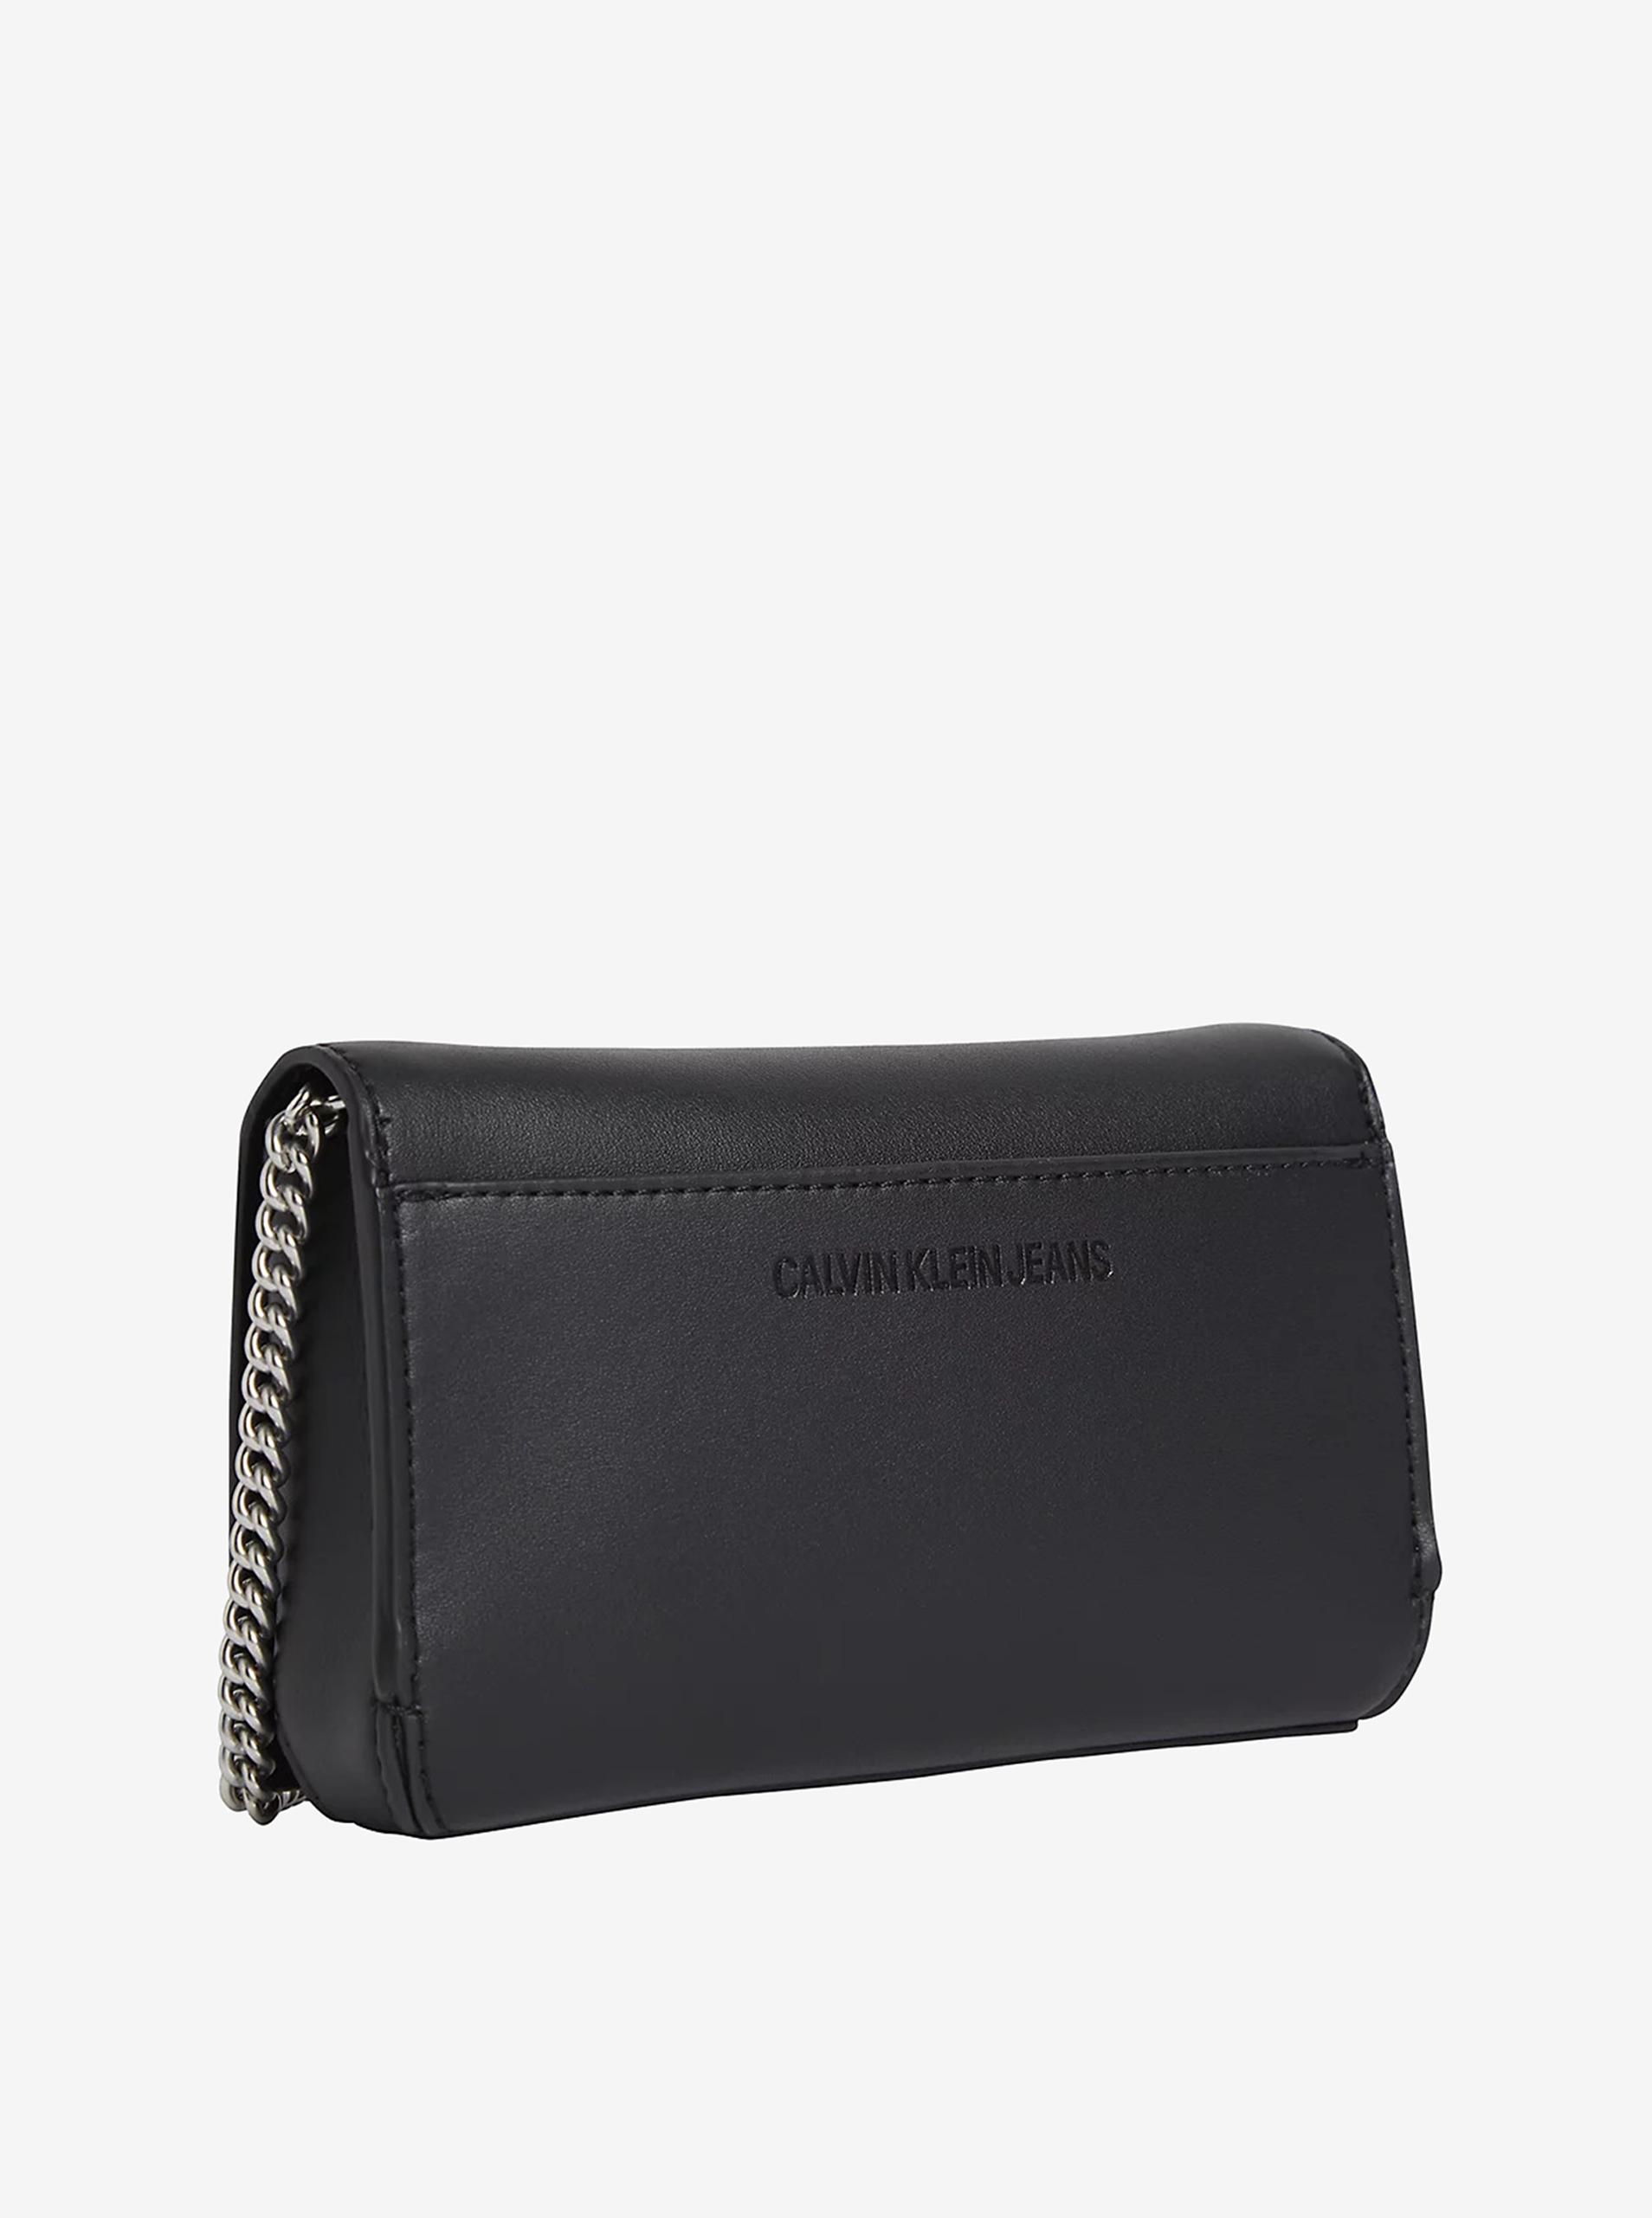 Calvin Klein černá crossbody kabelka